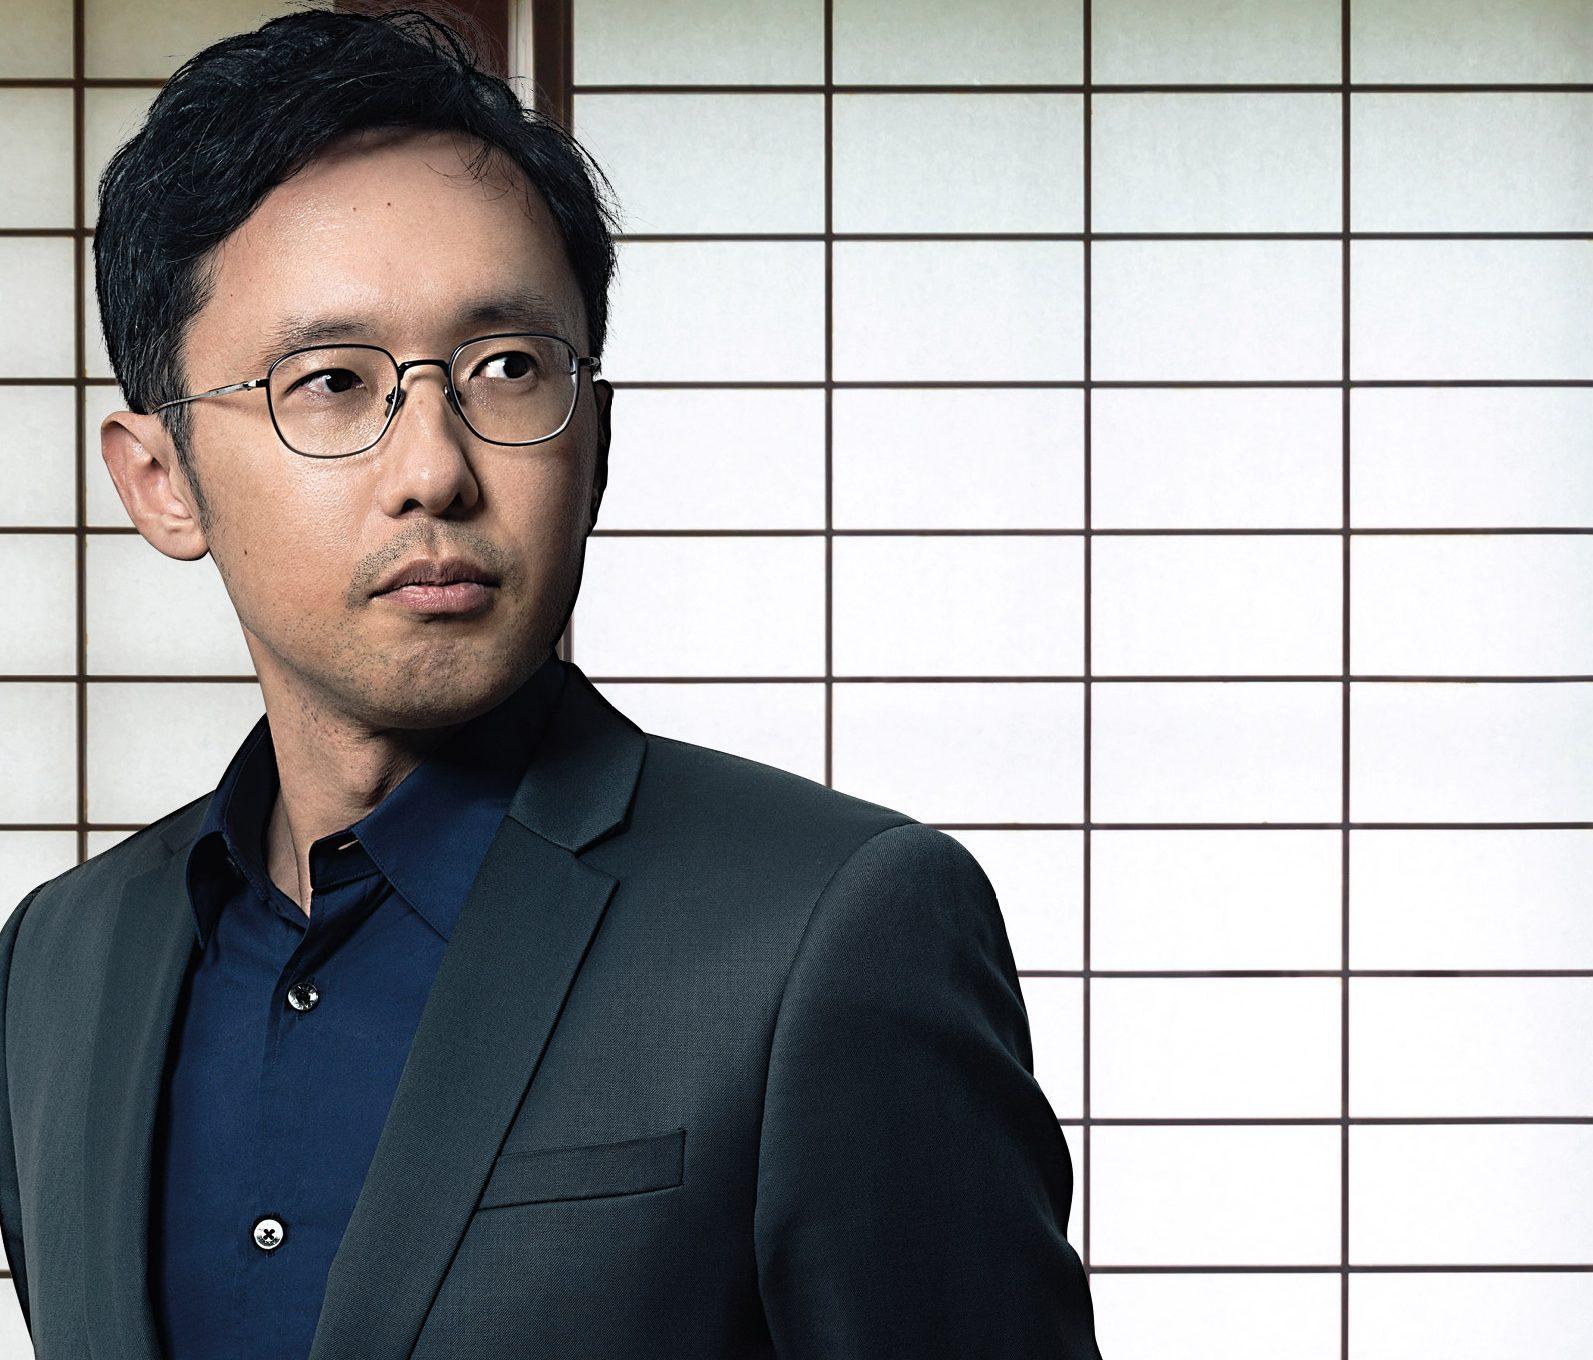 INTERVIEW : MASUNAGA // THE ART OF CRAFTSMANSHIP